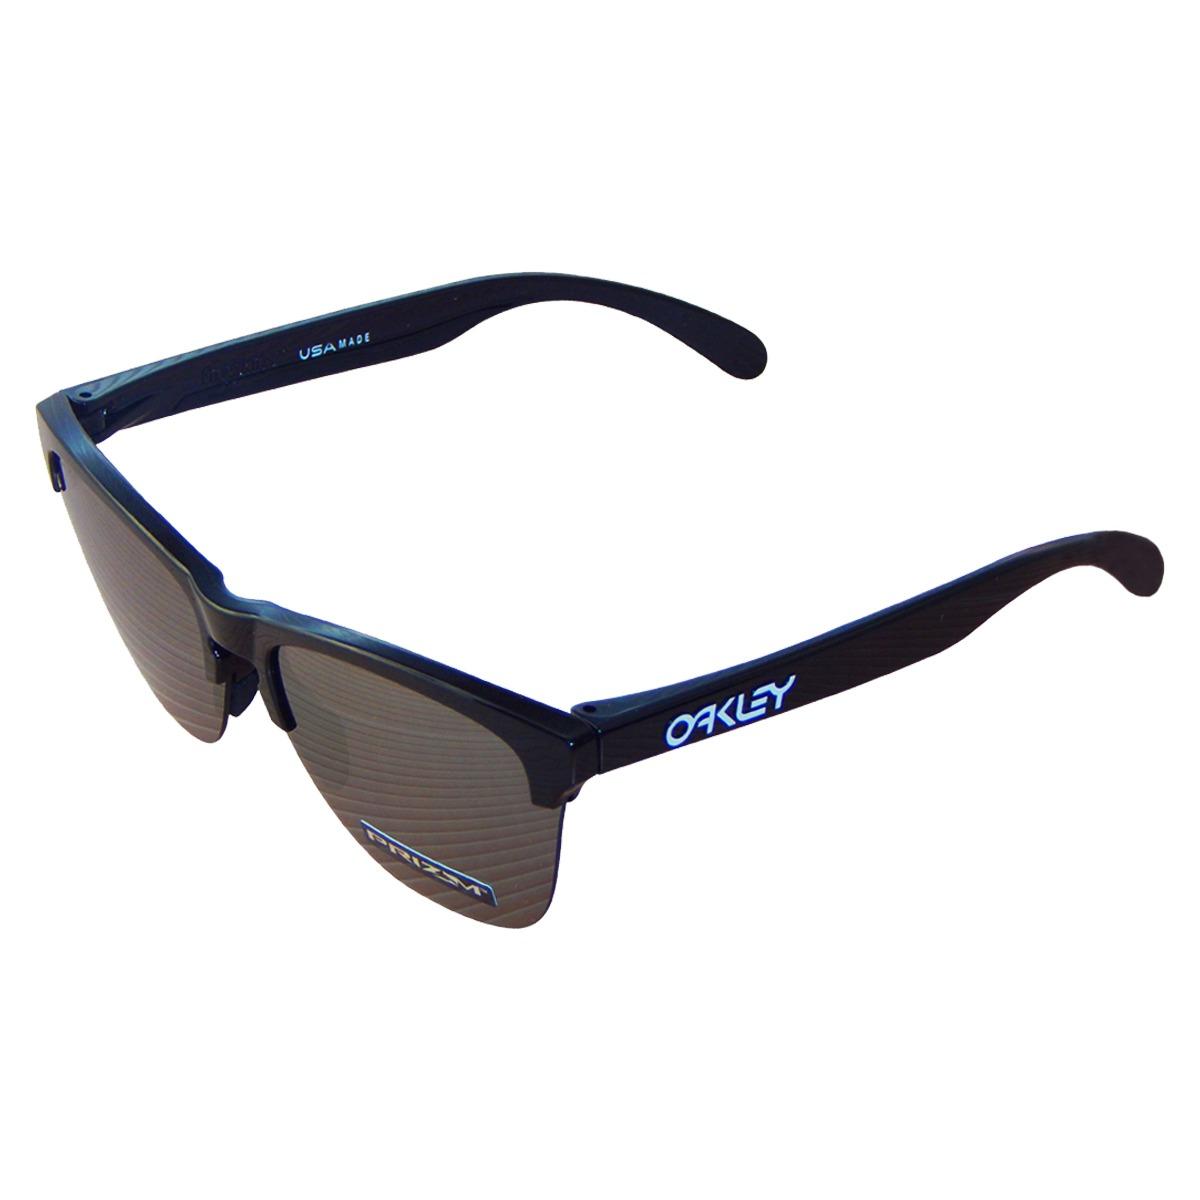 Óculos Oakley Frogskins Lite Polished Black  Lente Prizm Bla - R ... 80a7c71762